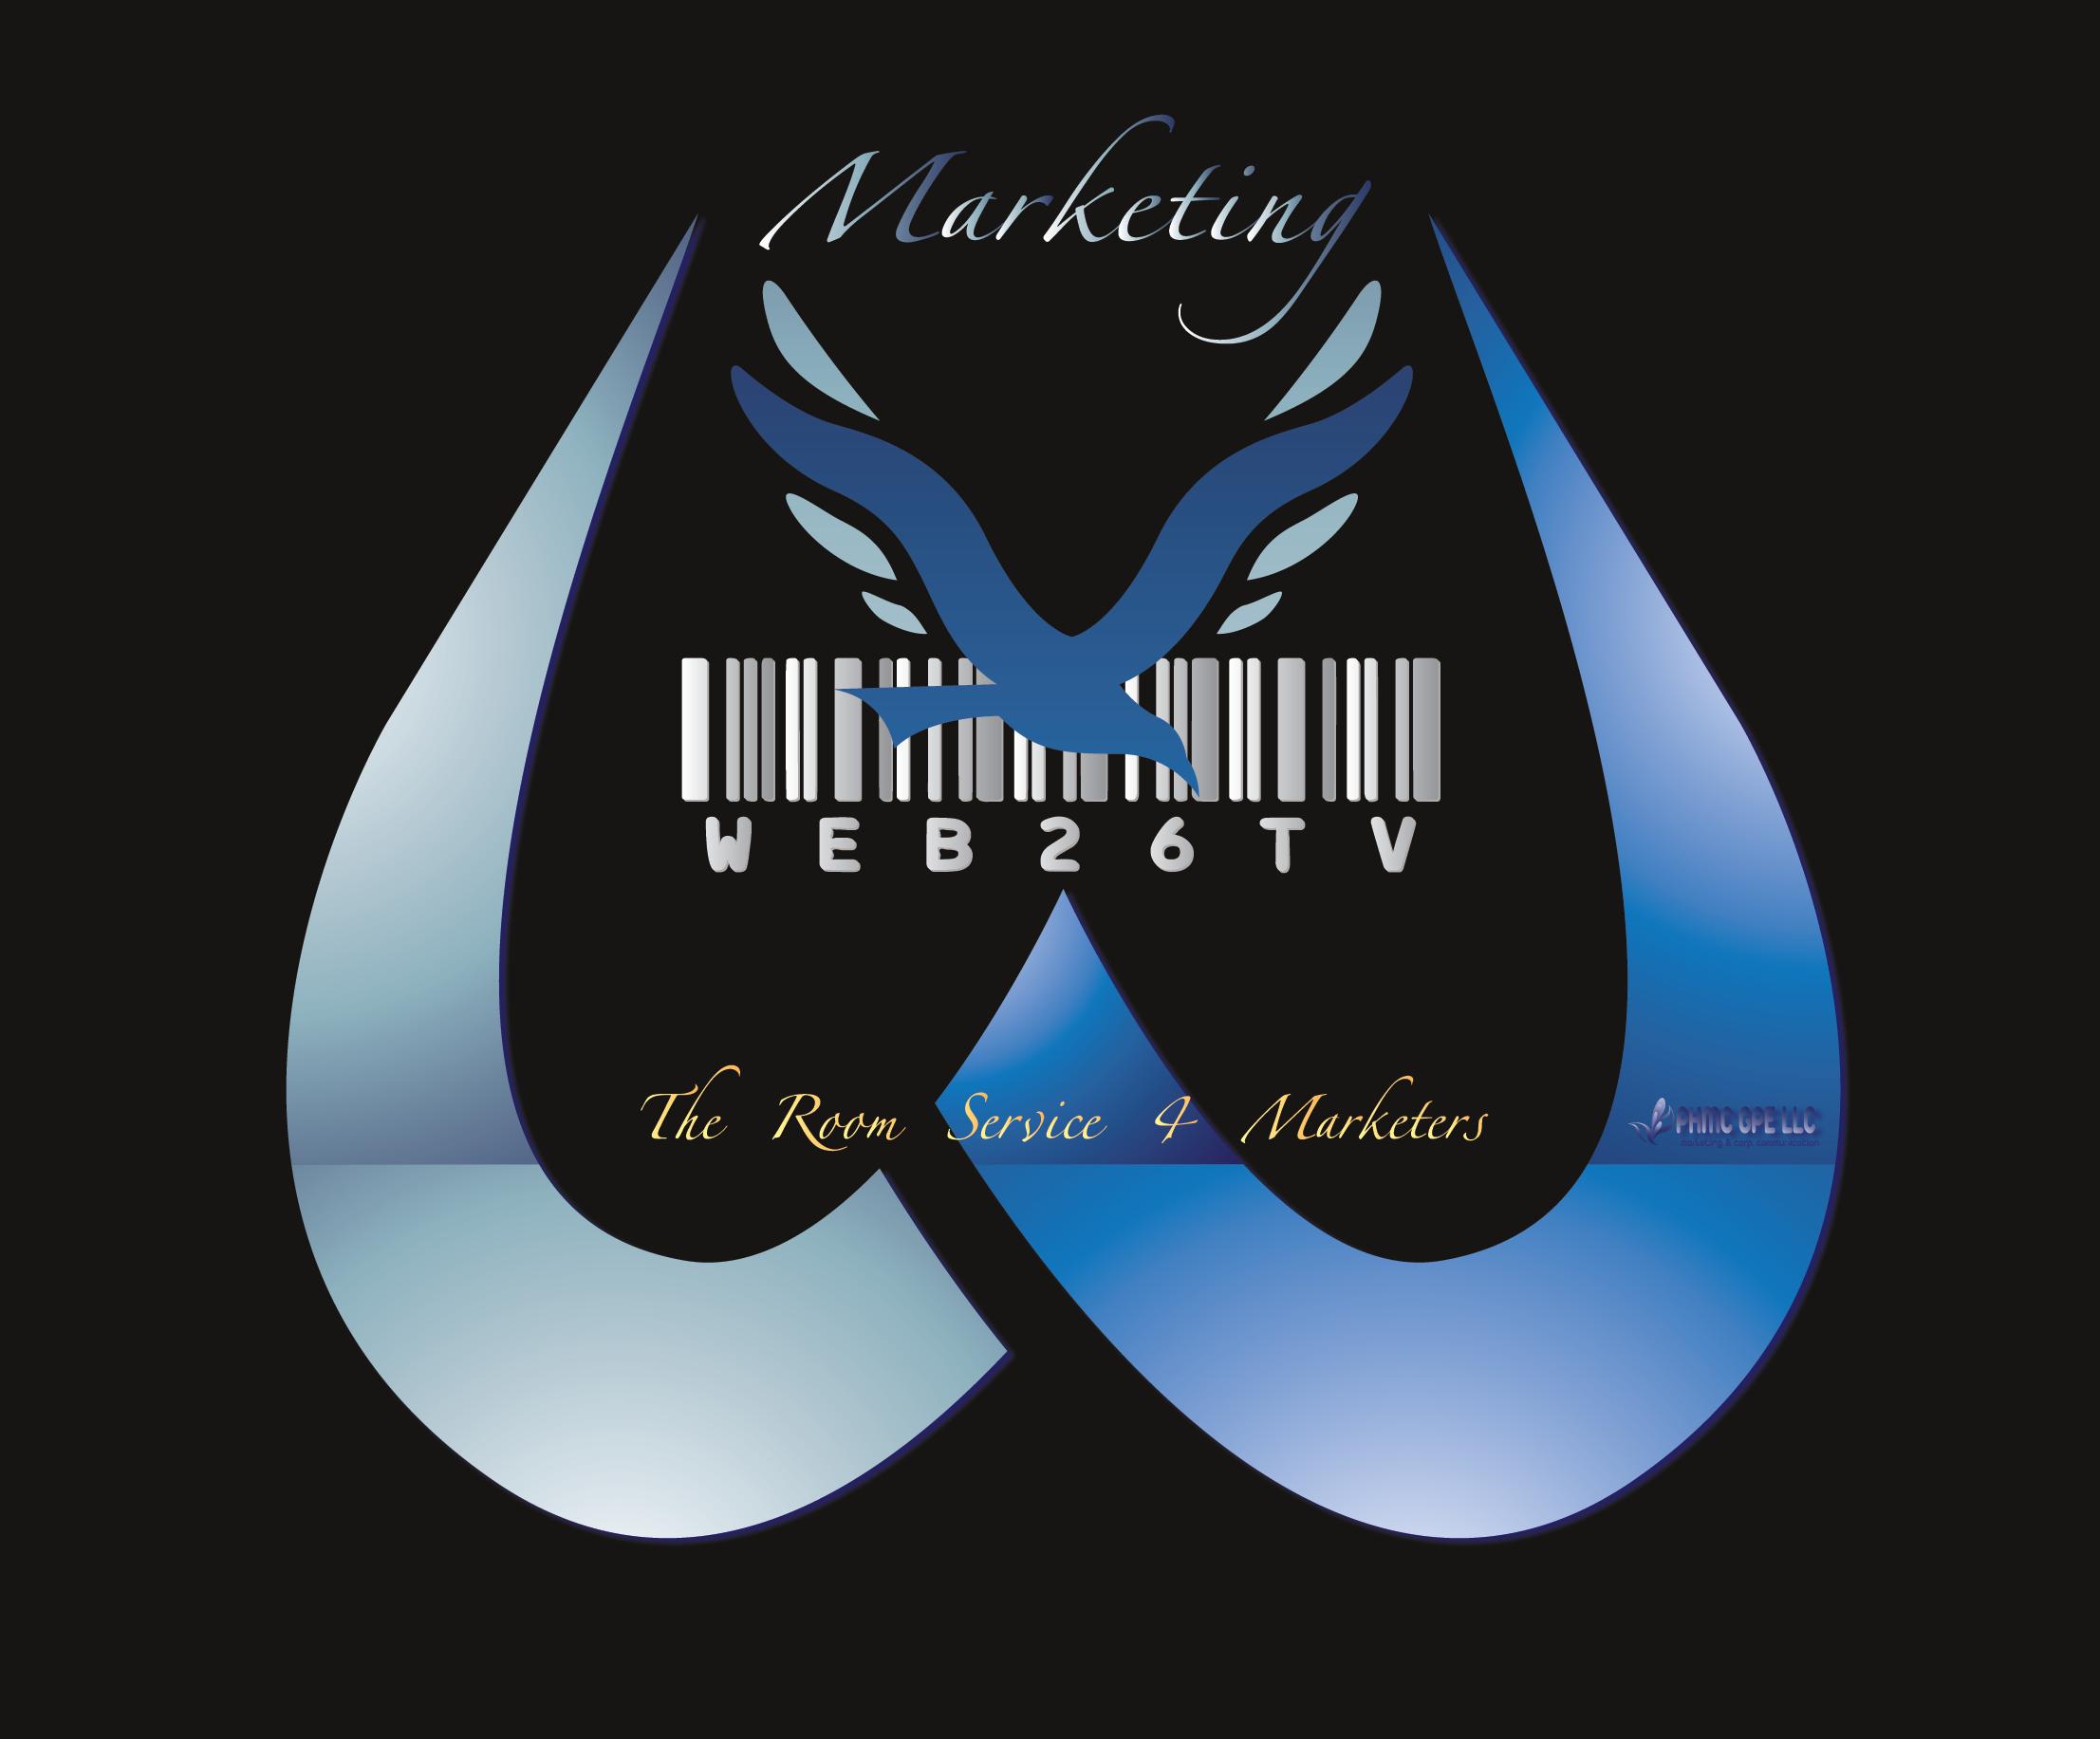 Web26-Marketing_sketch-01.png